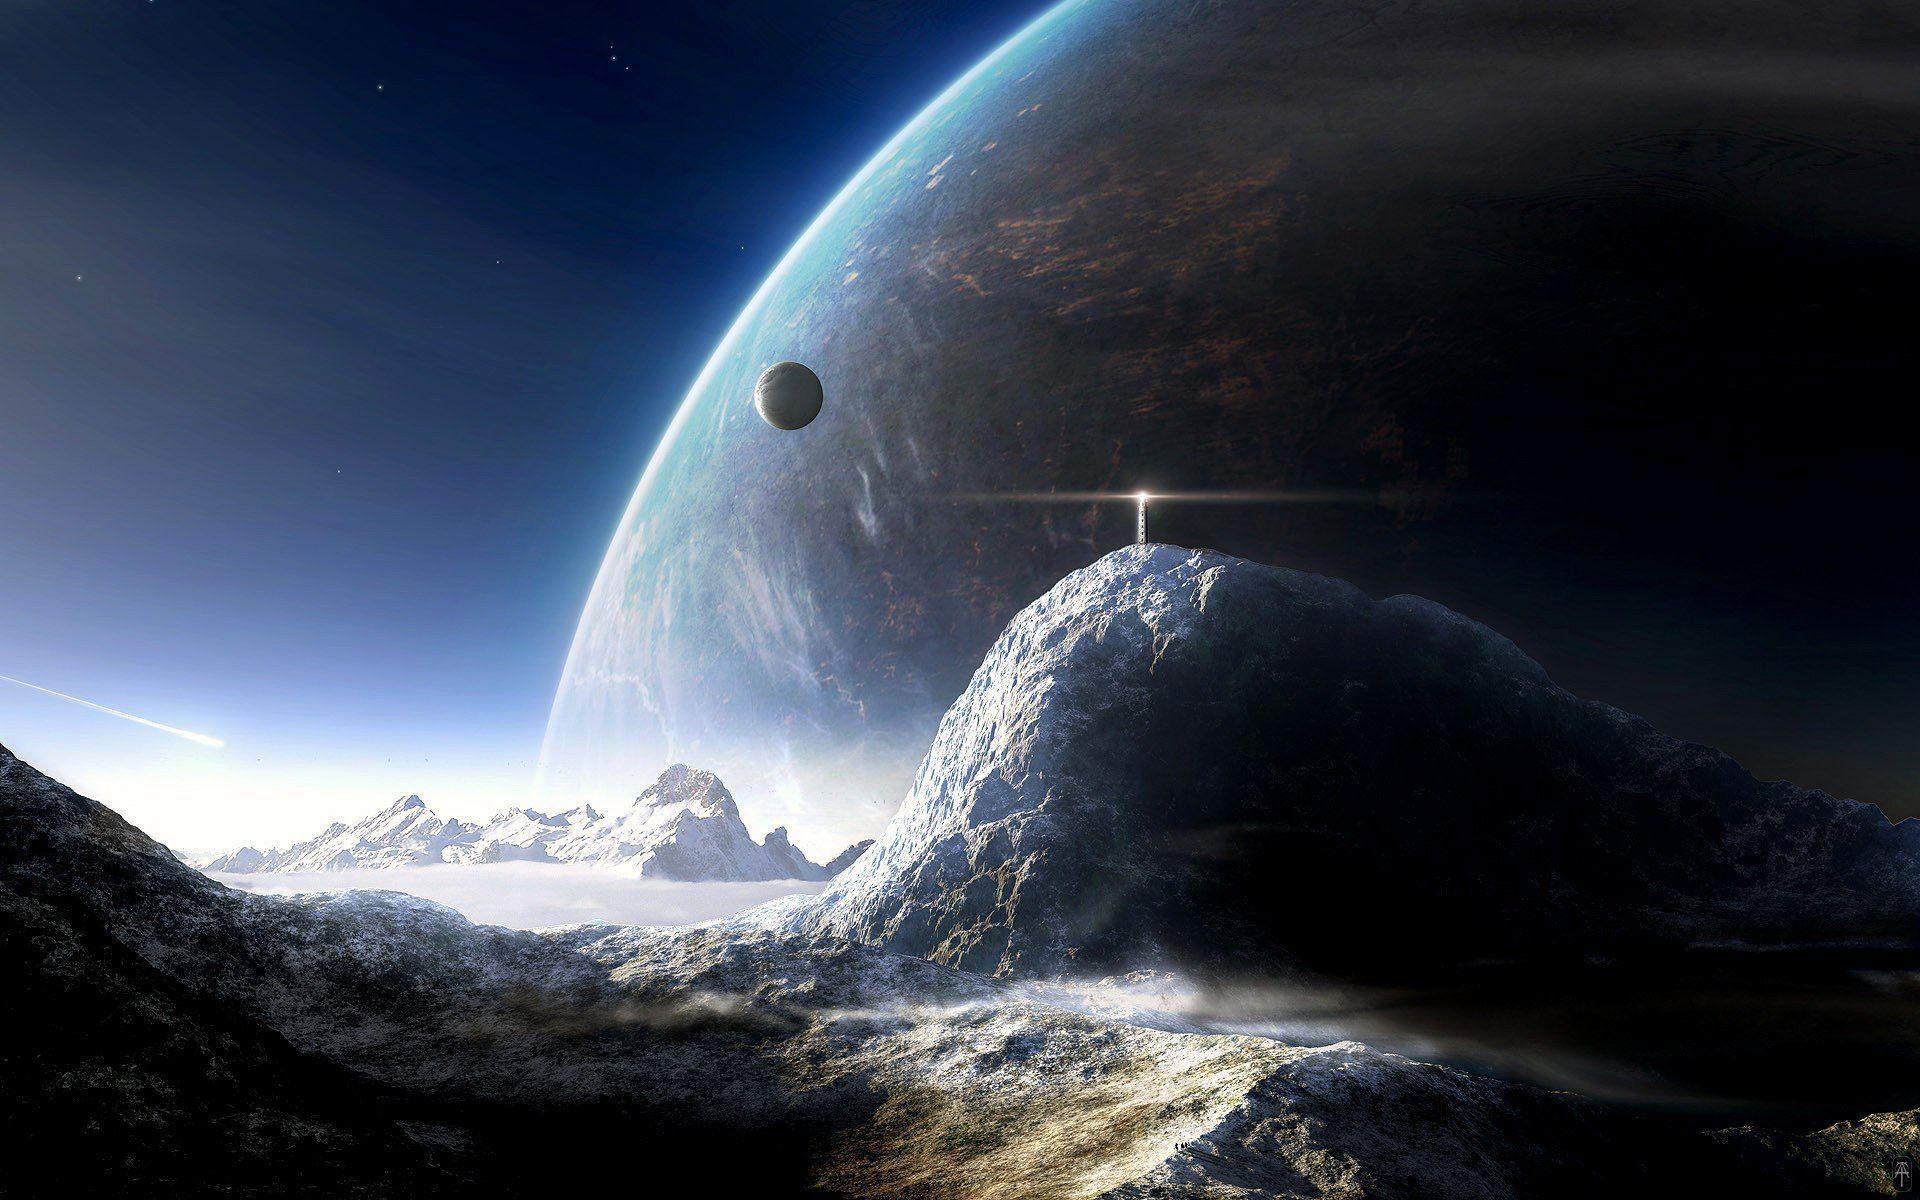 Sci Fi Screensavers